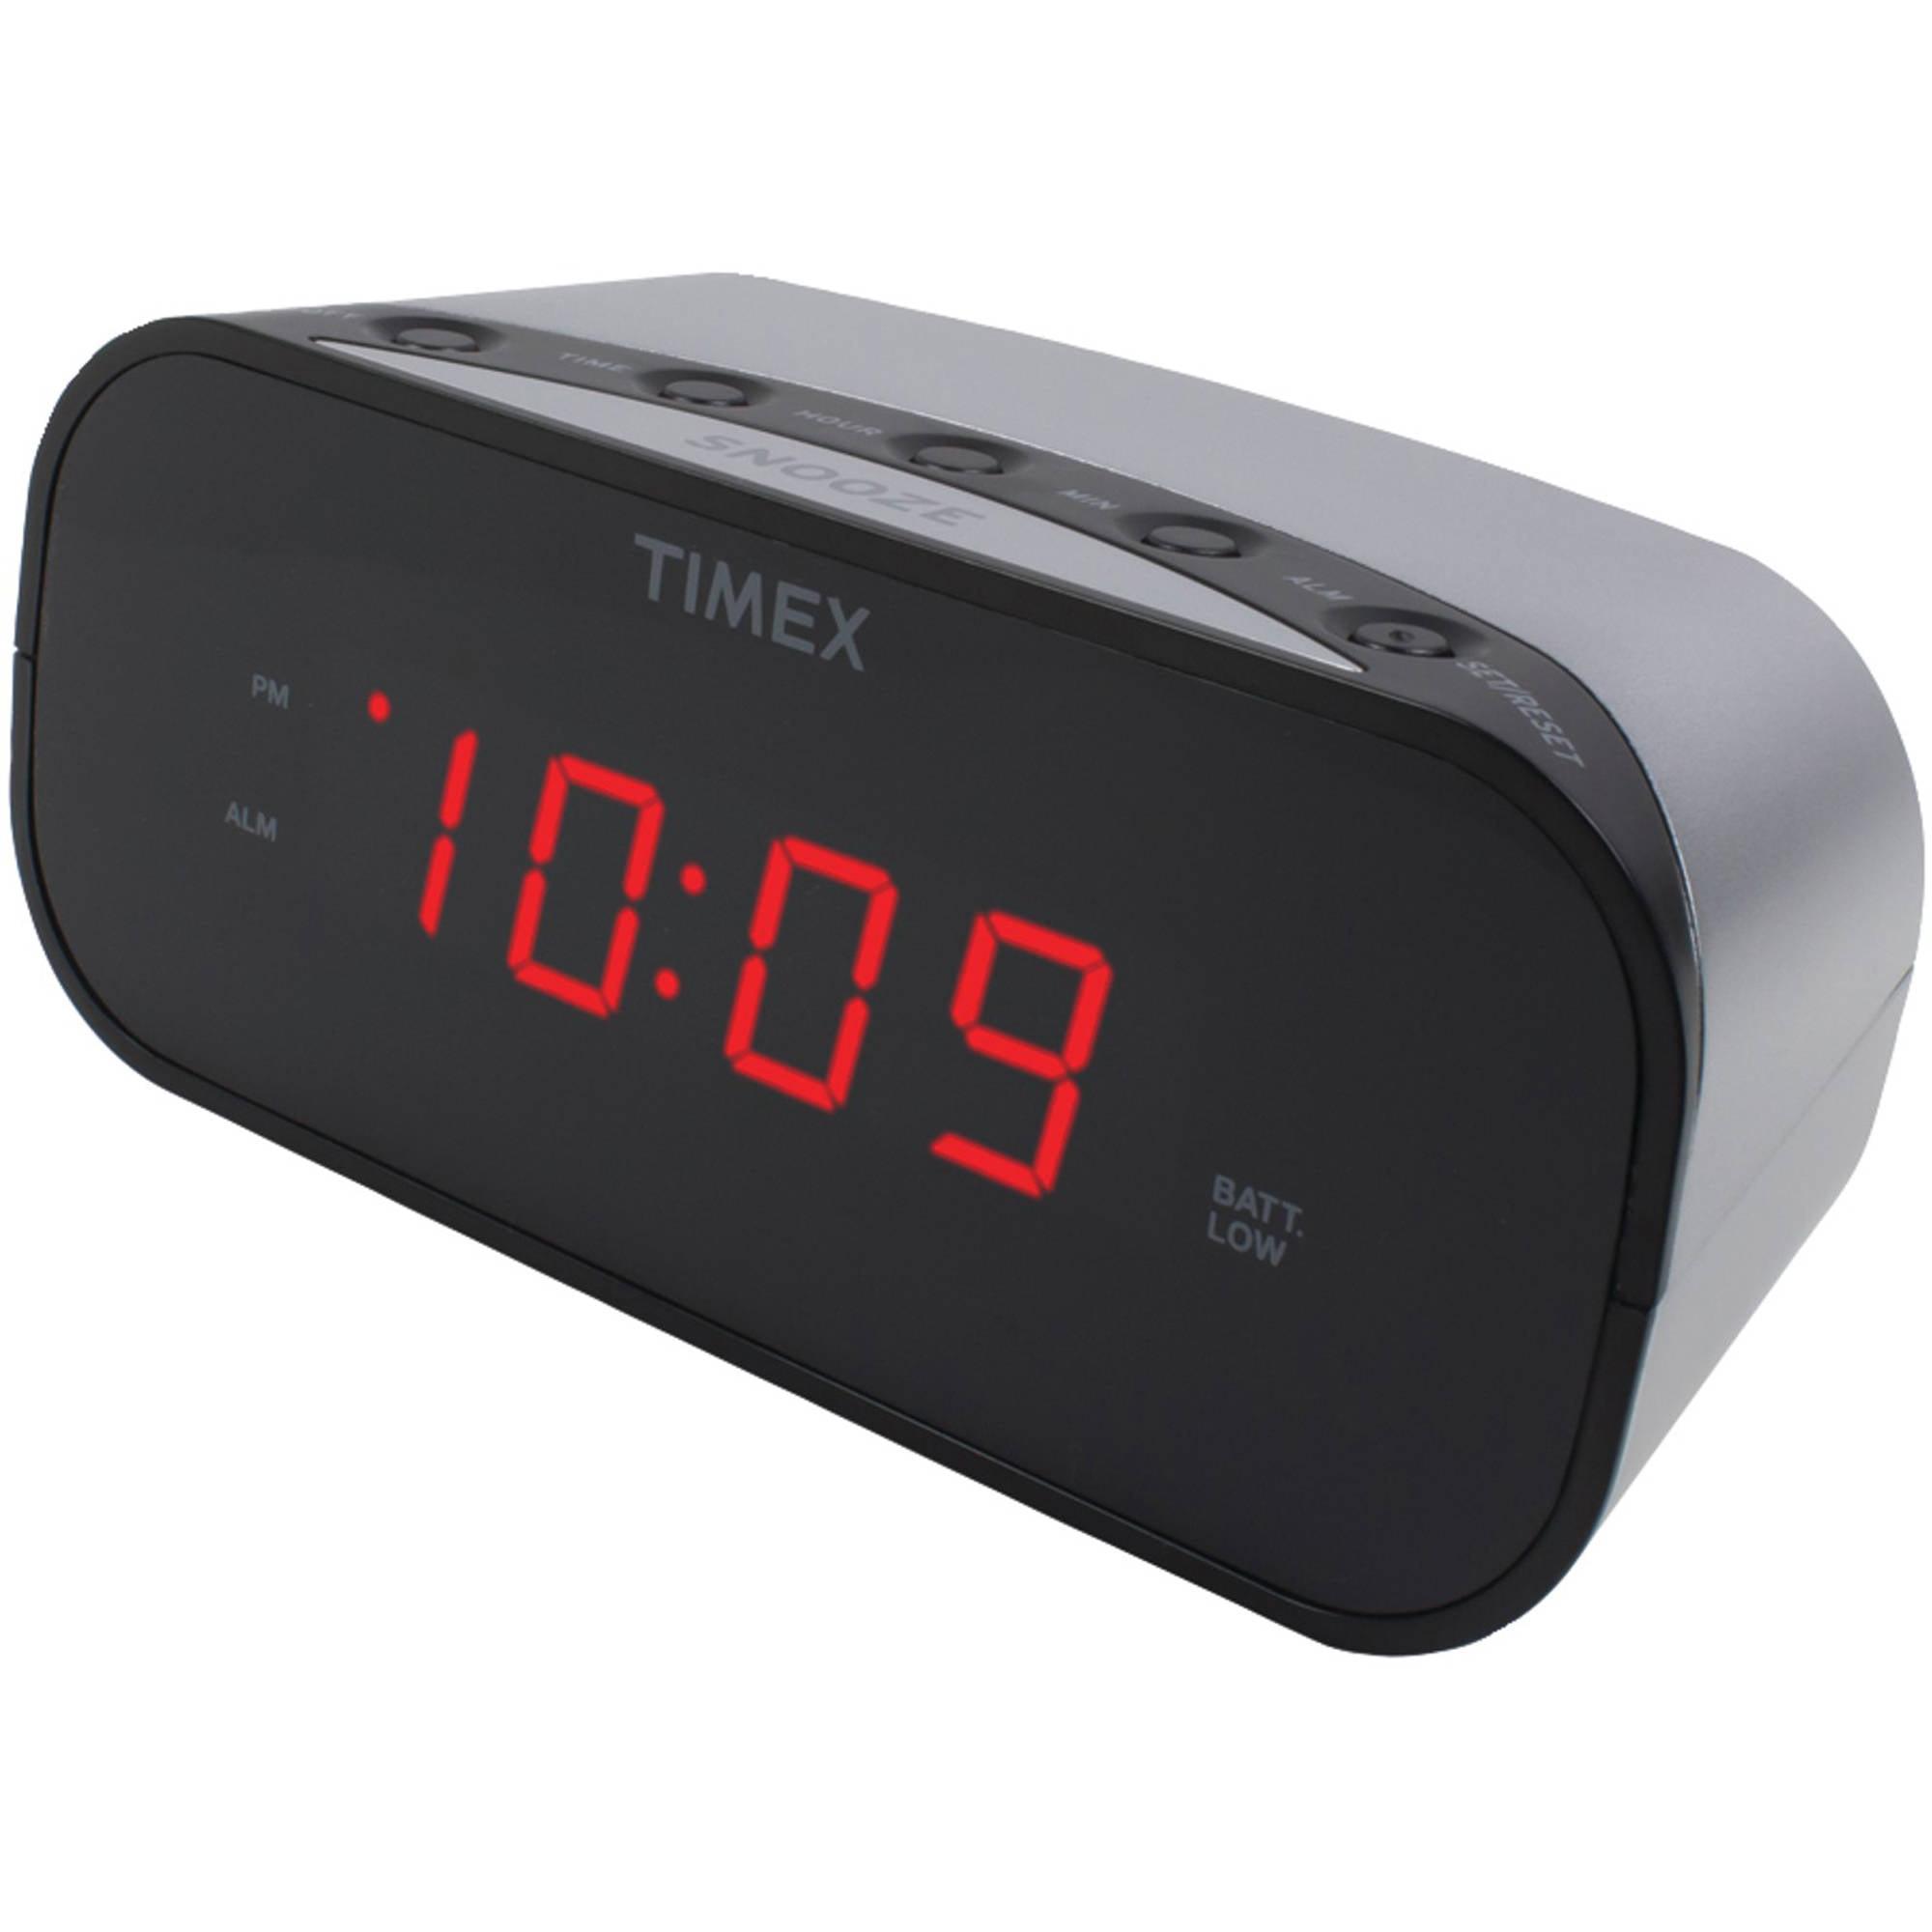 image timex alarm clock radio manual download ideas home. Black Bedroom Furniture Sets. Home Design Ideas